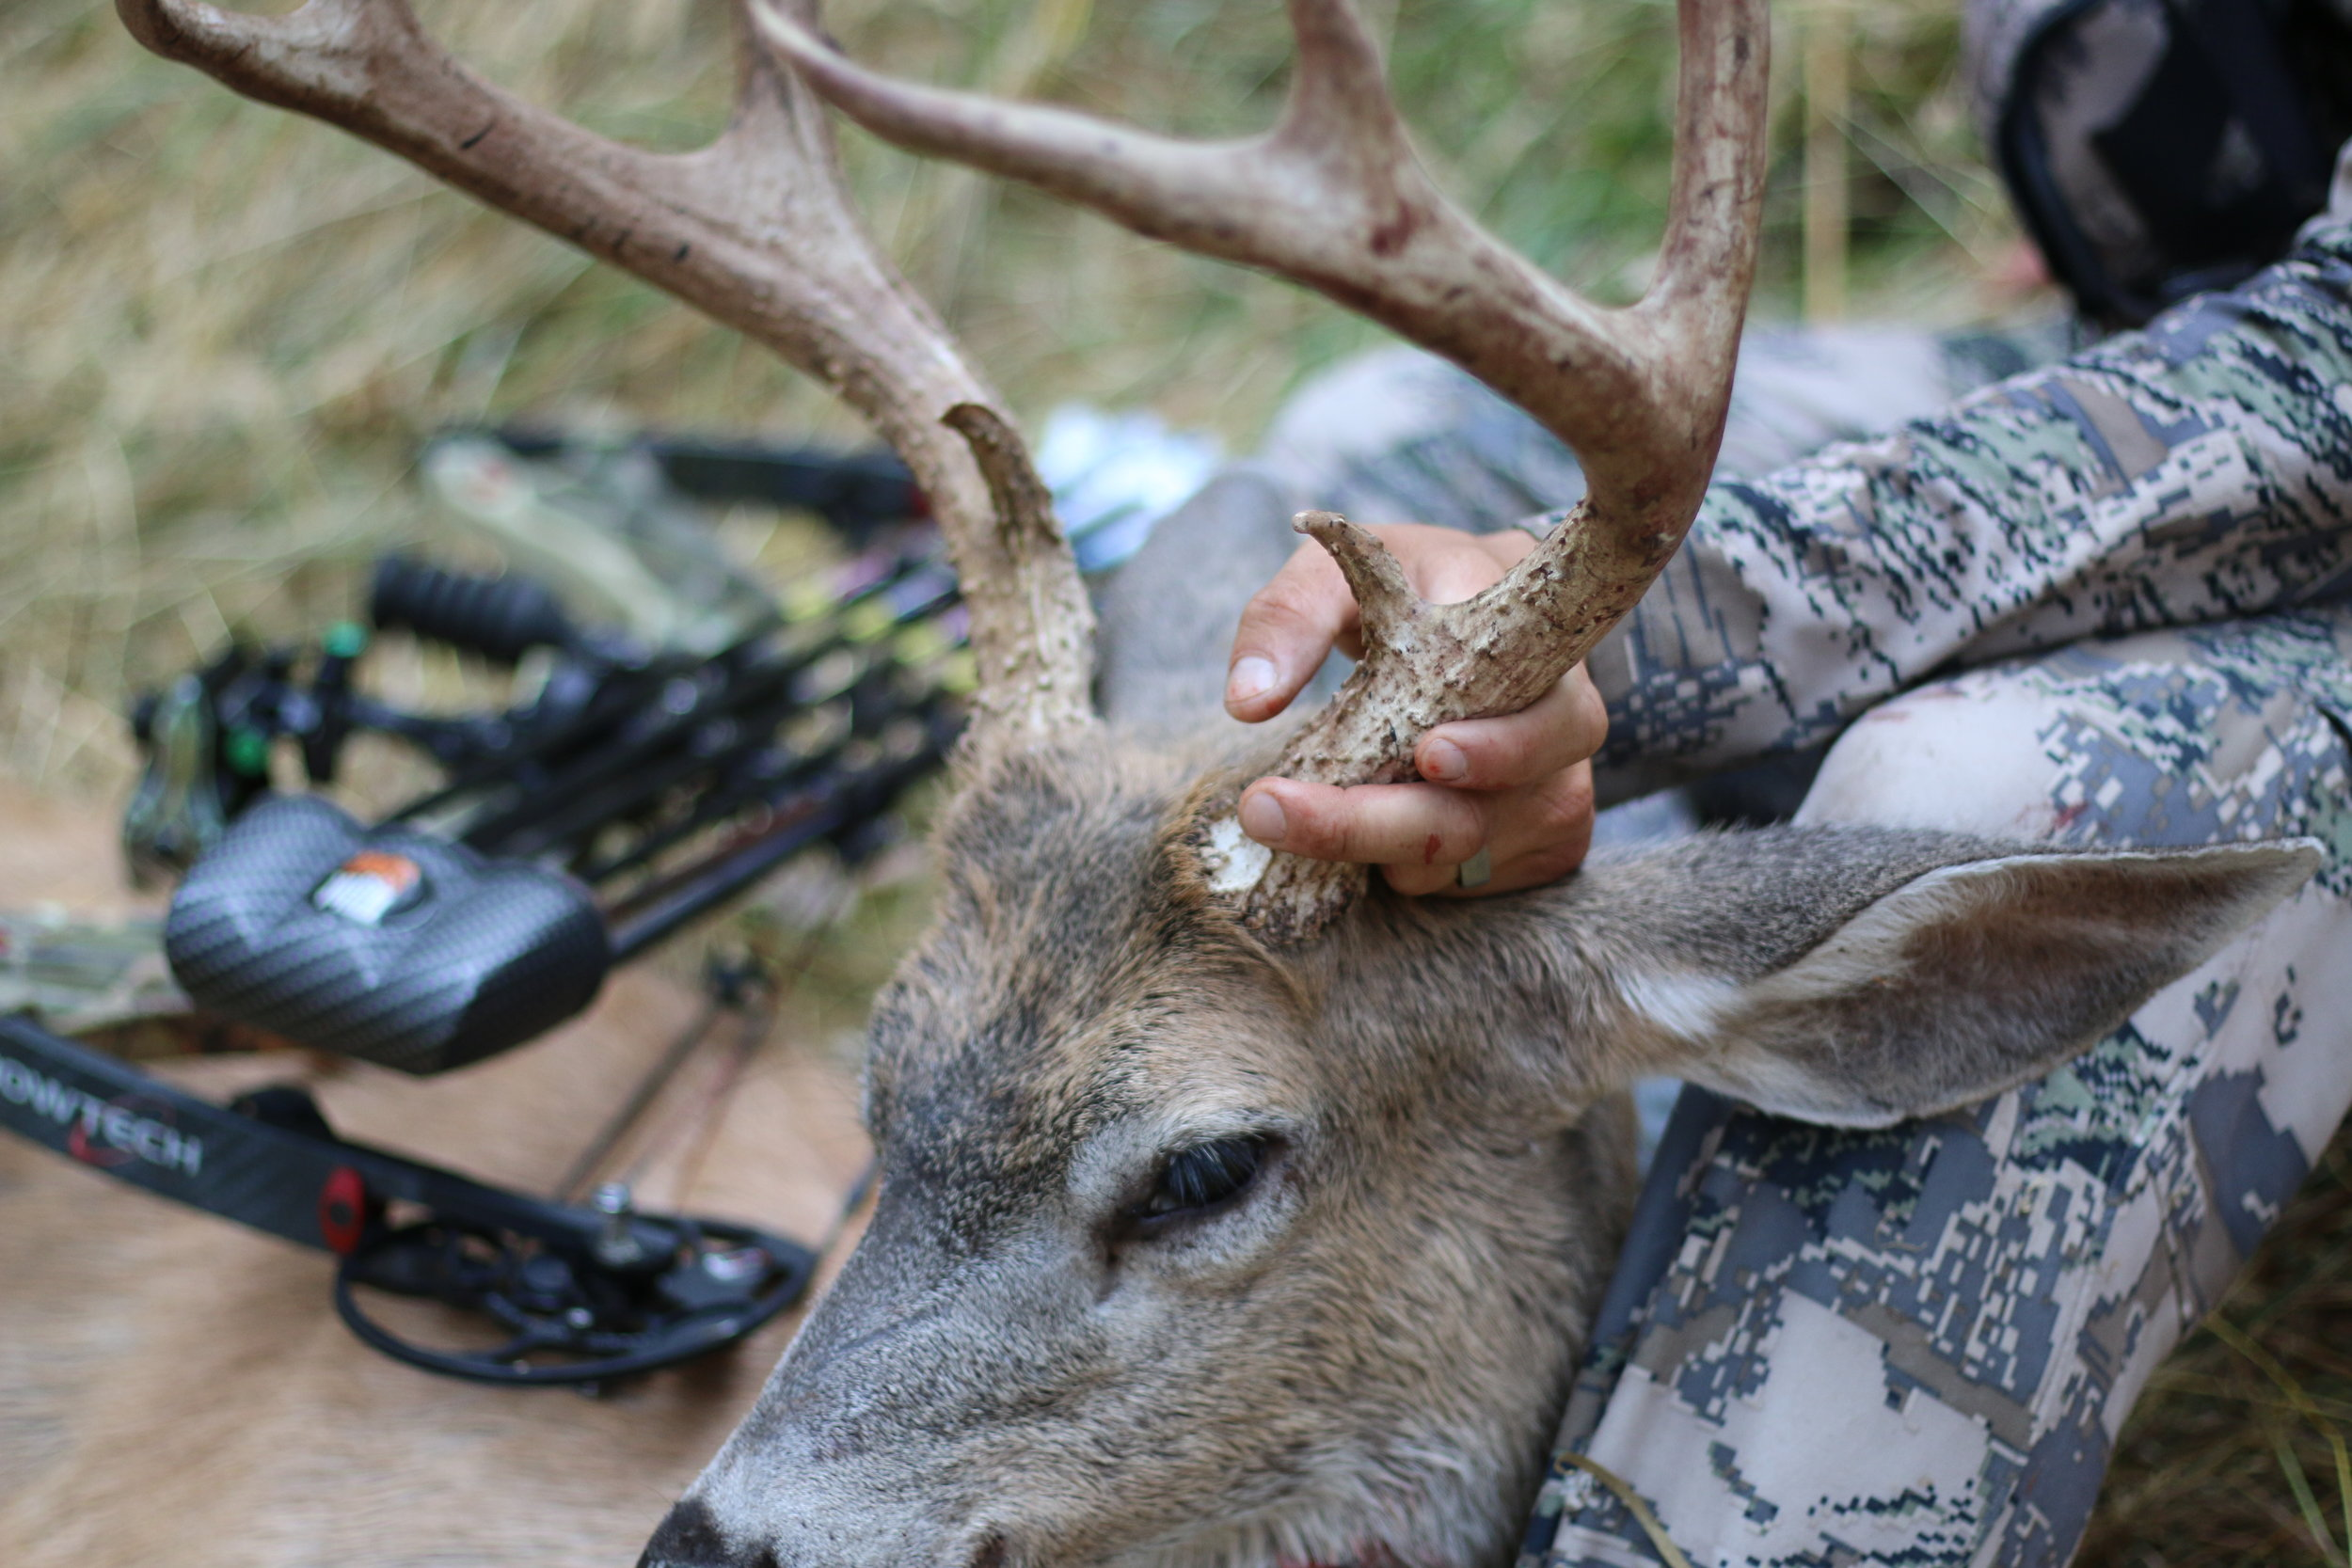 Blacktail deer | Wild boar | Turkey | waterfowl | Upland